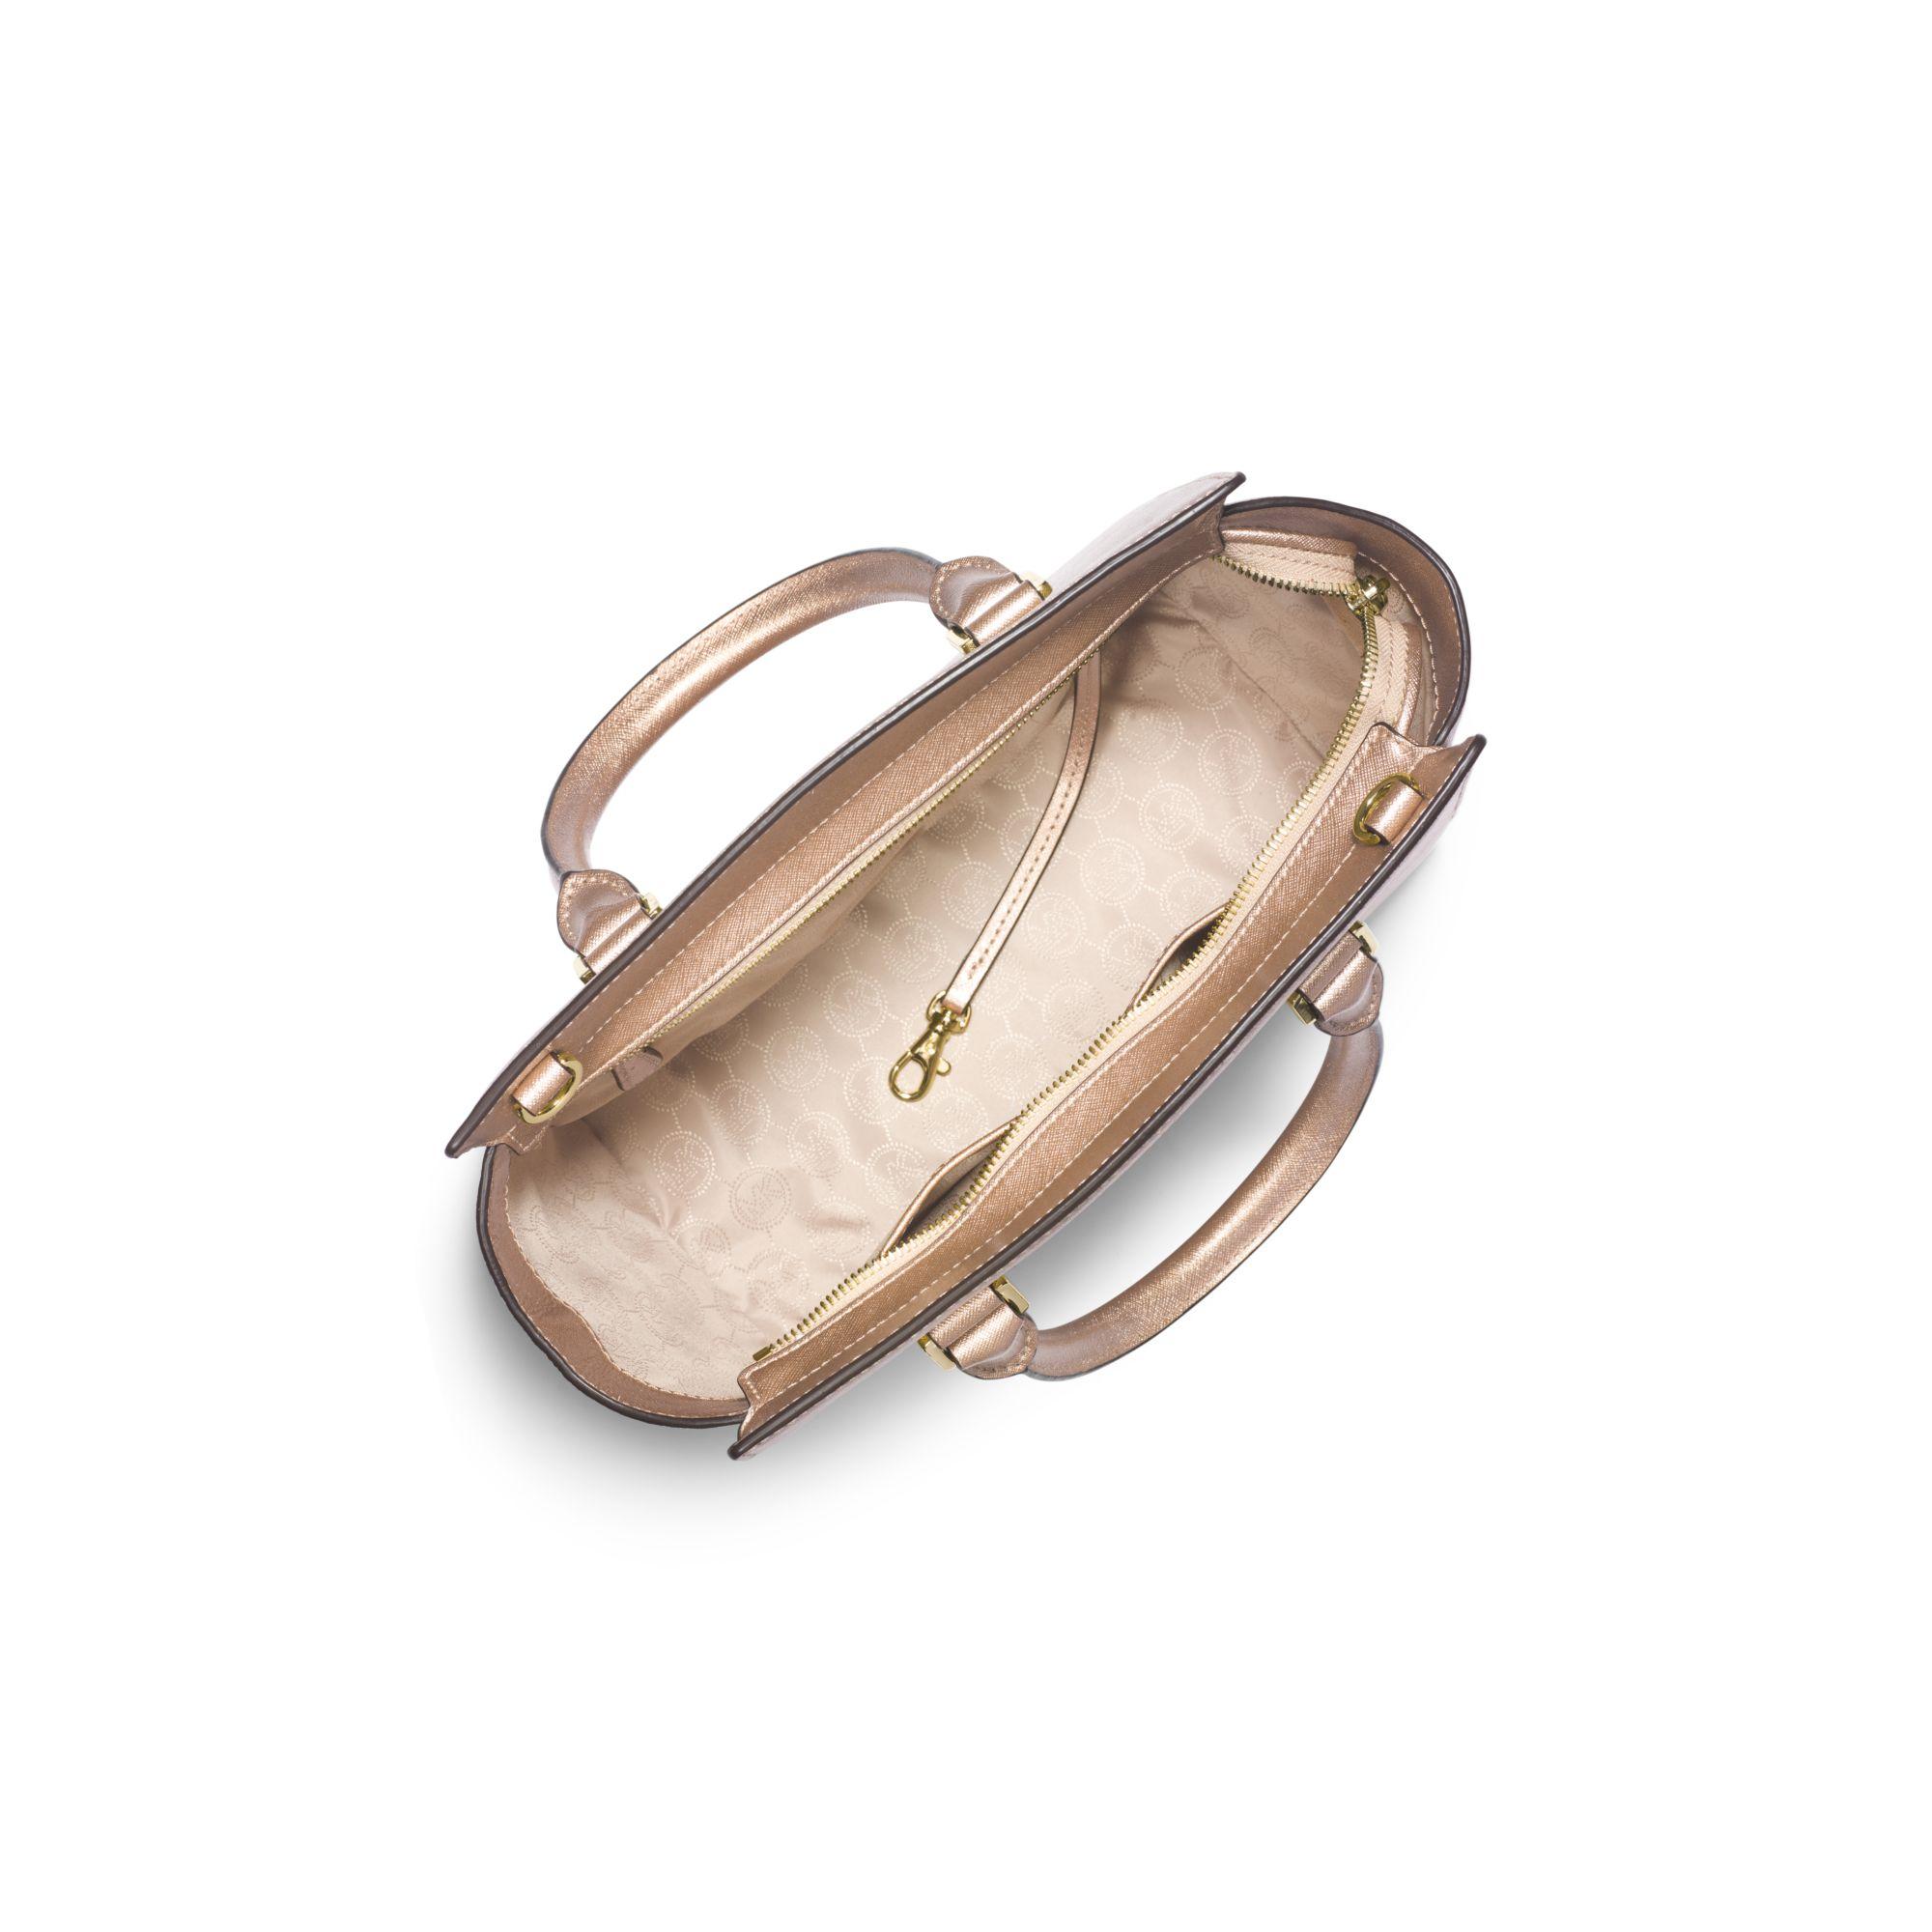 541eb879fdd8 Michael Kors Selma Medium Metallic Leather Satchel in Metallic - Lyst